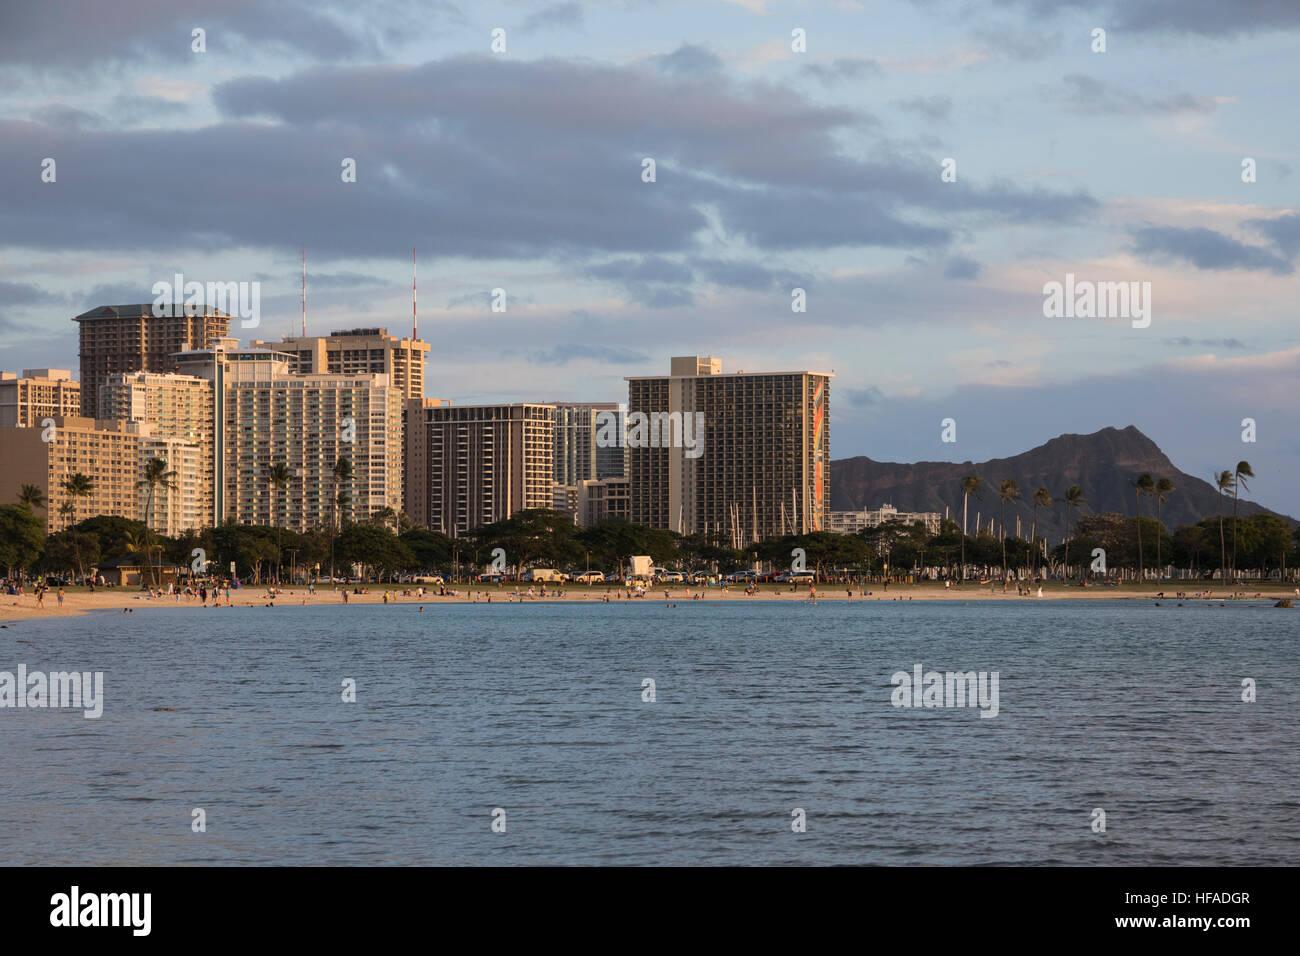 Una vista degli hotel di Waikiki dall'Ala Moana Beach Park a Honolulu. Immagini Stock